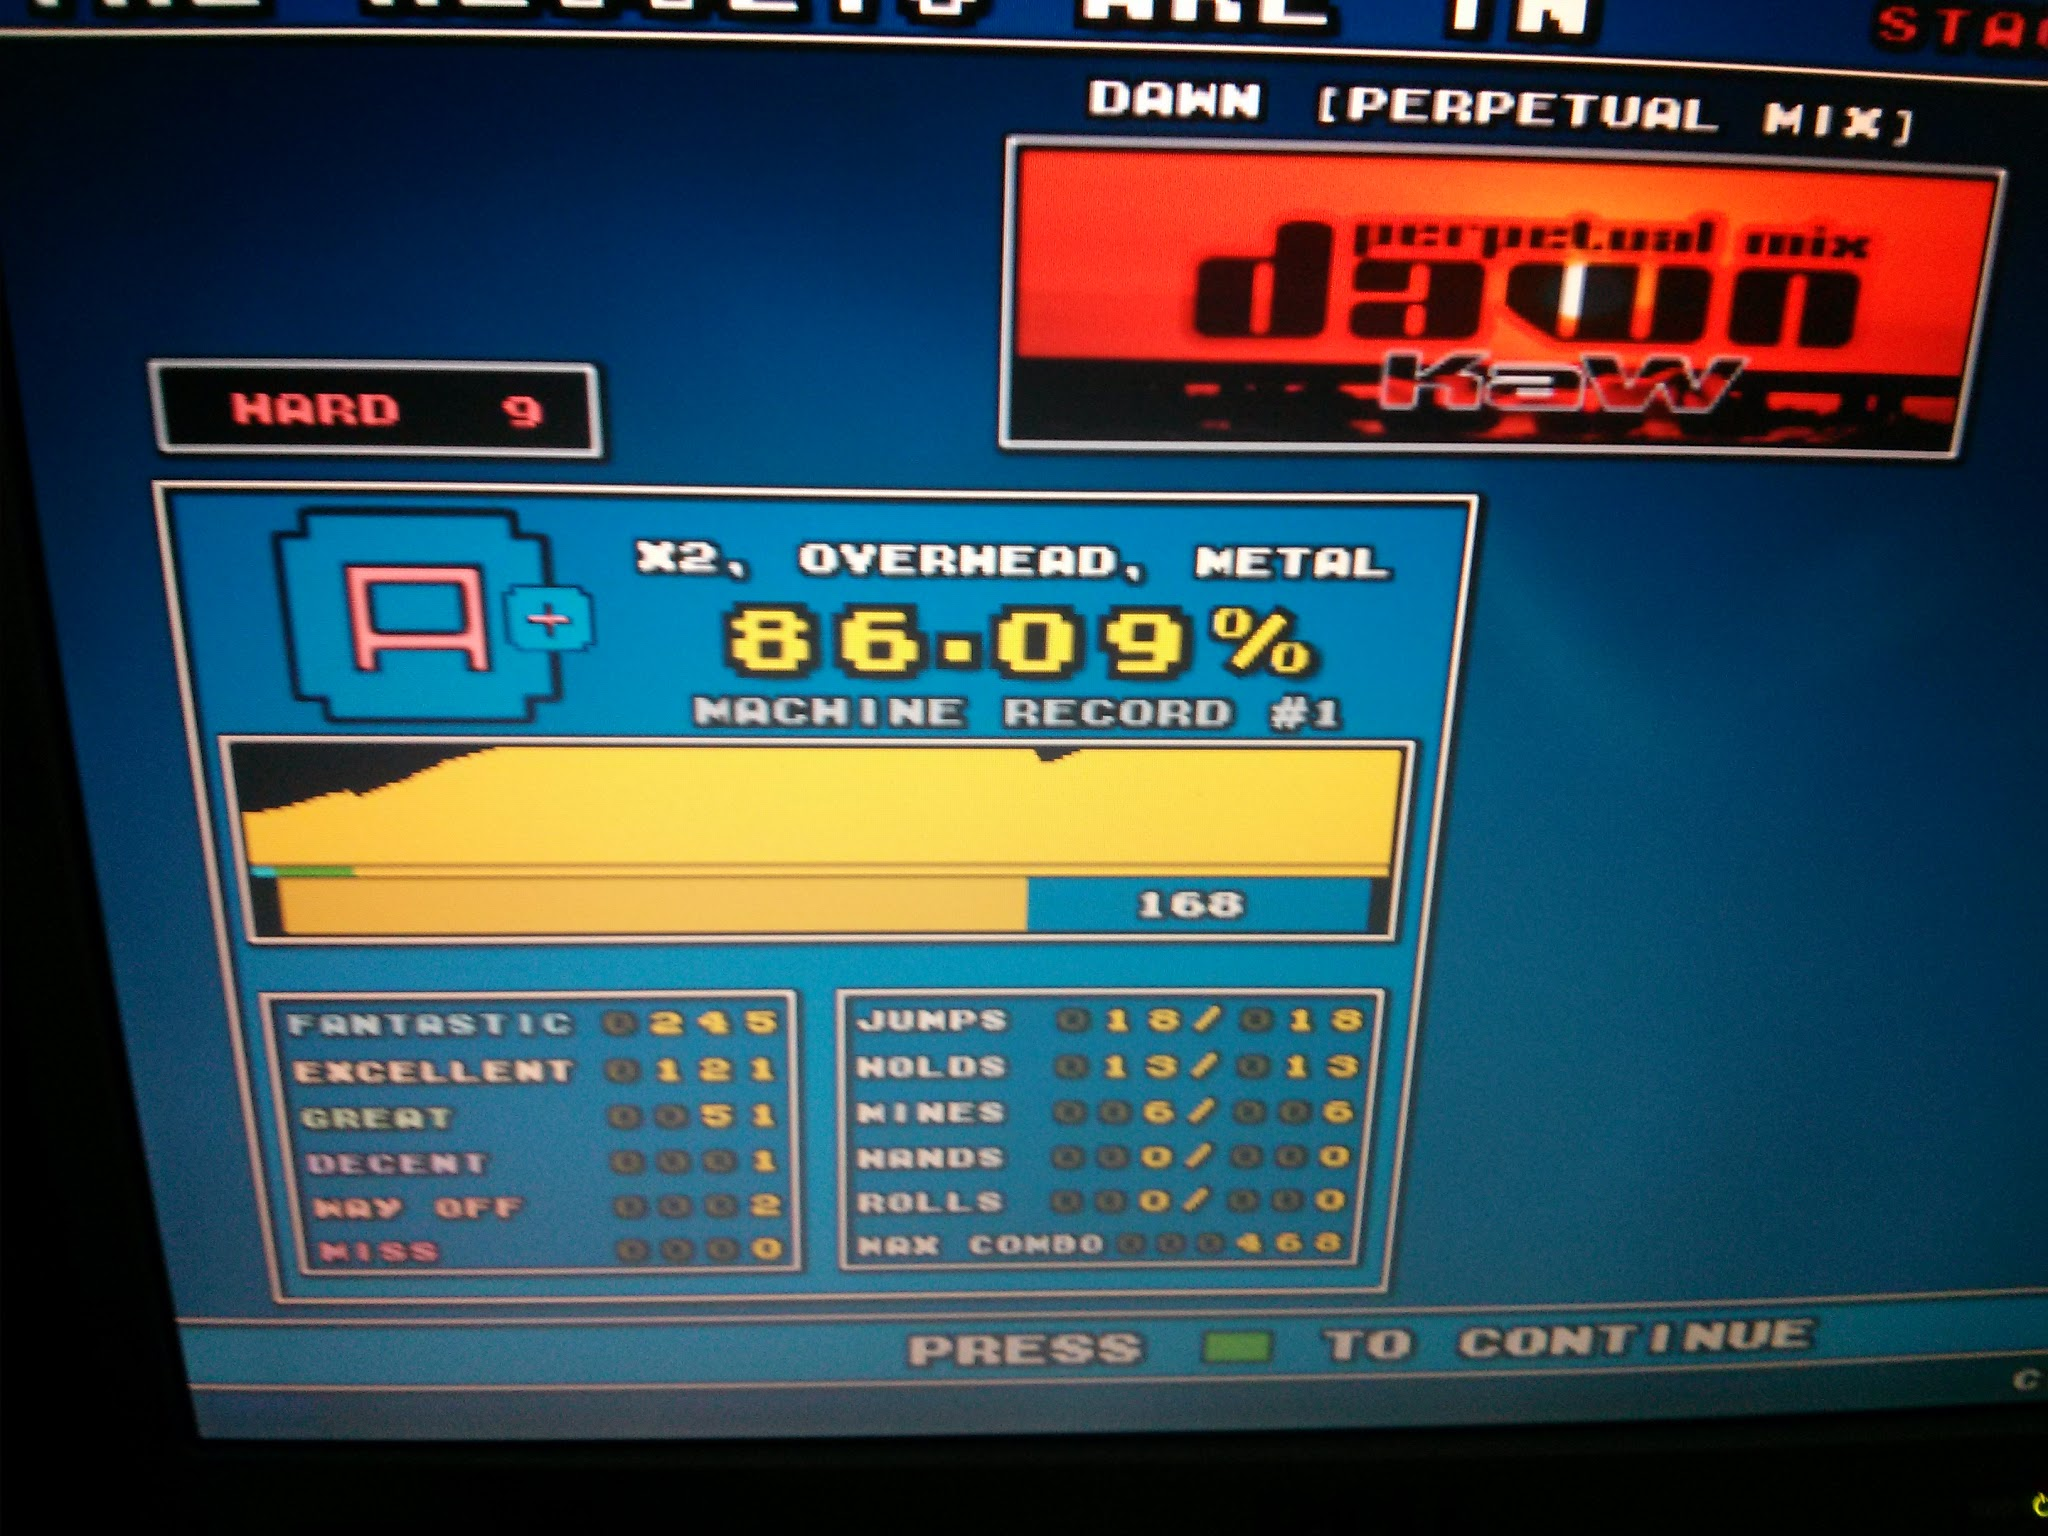 Dec 10th 2012 DDRITG Score 9